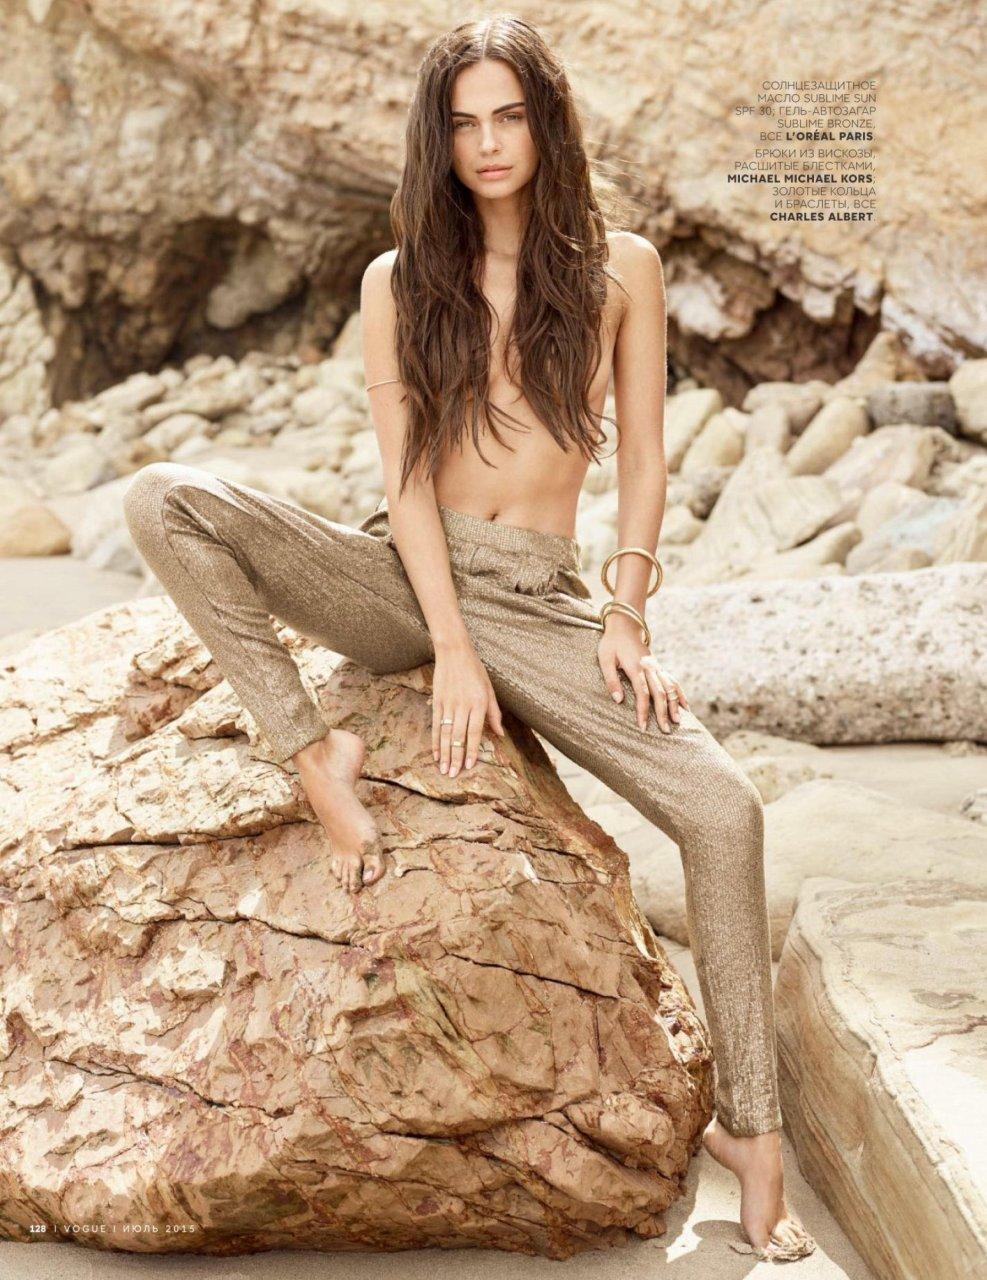 Model danielle lloyd